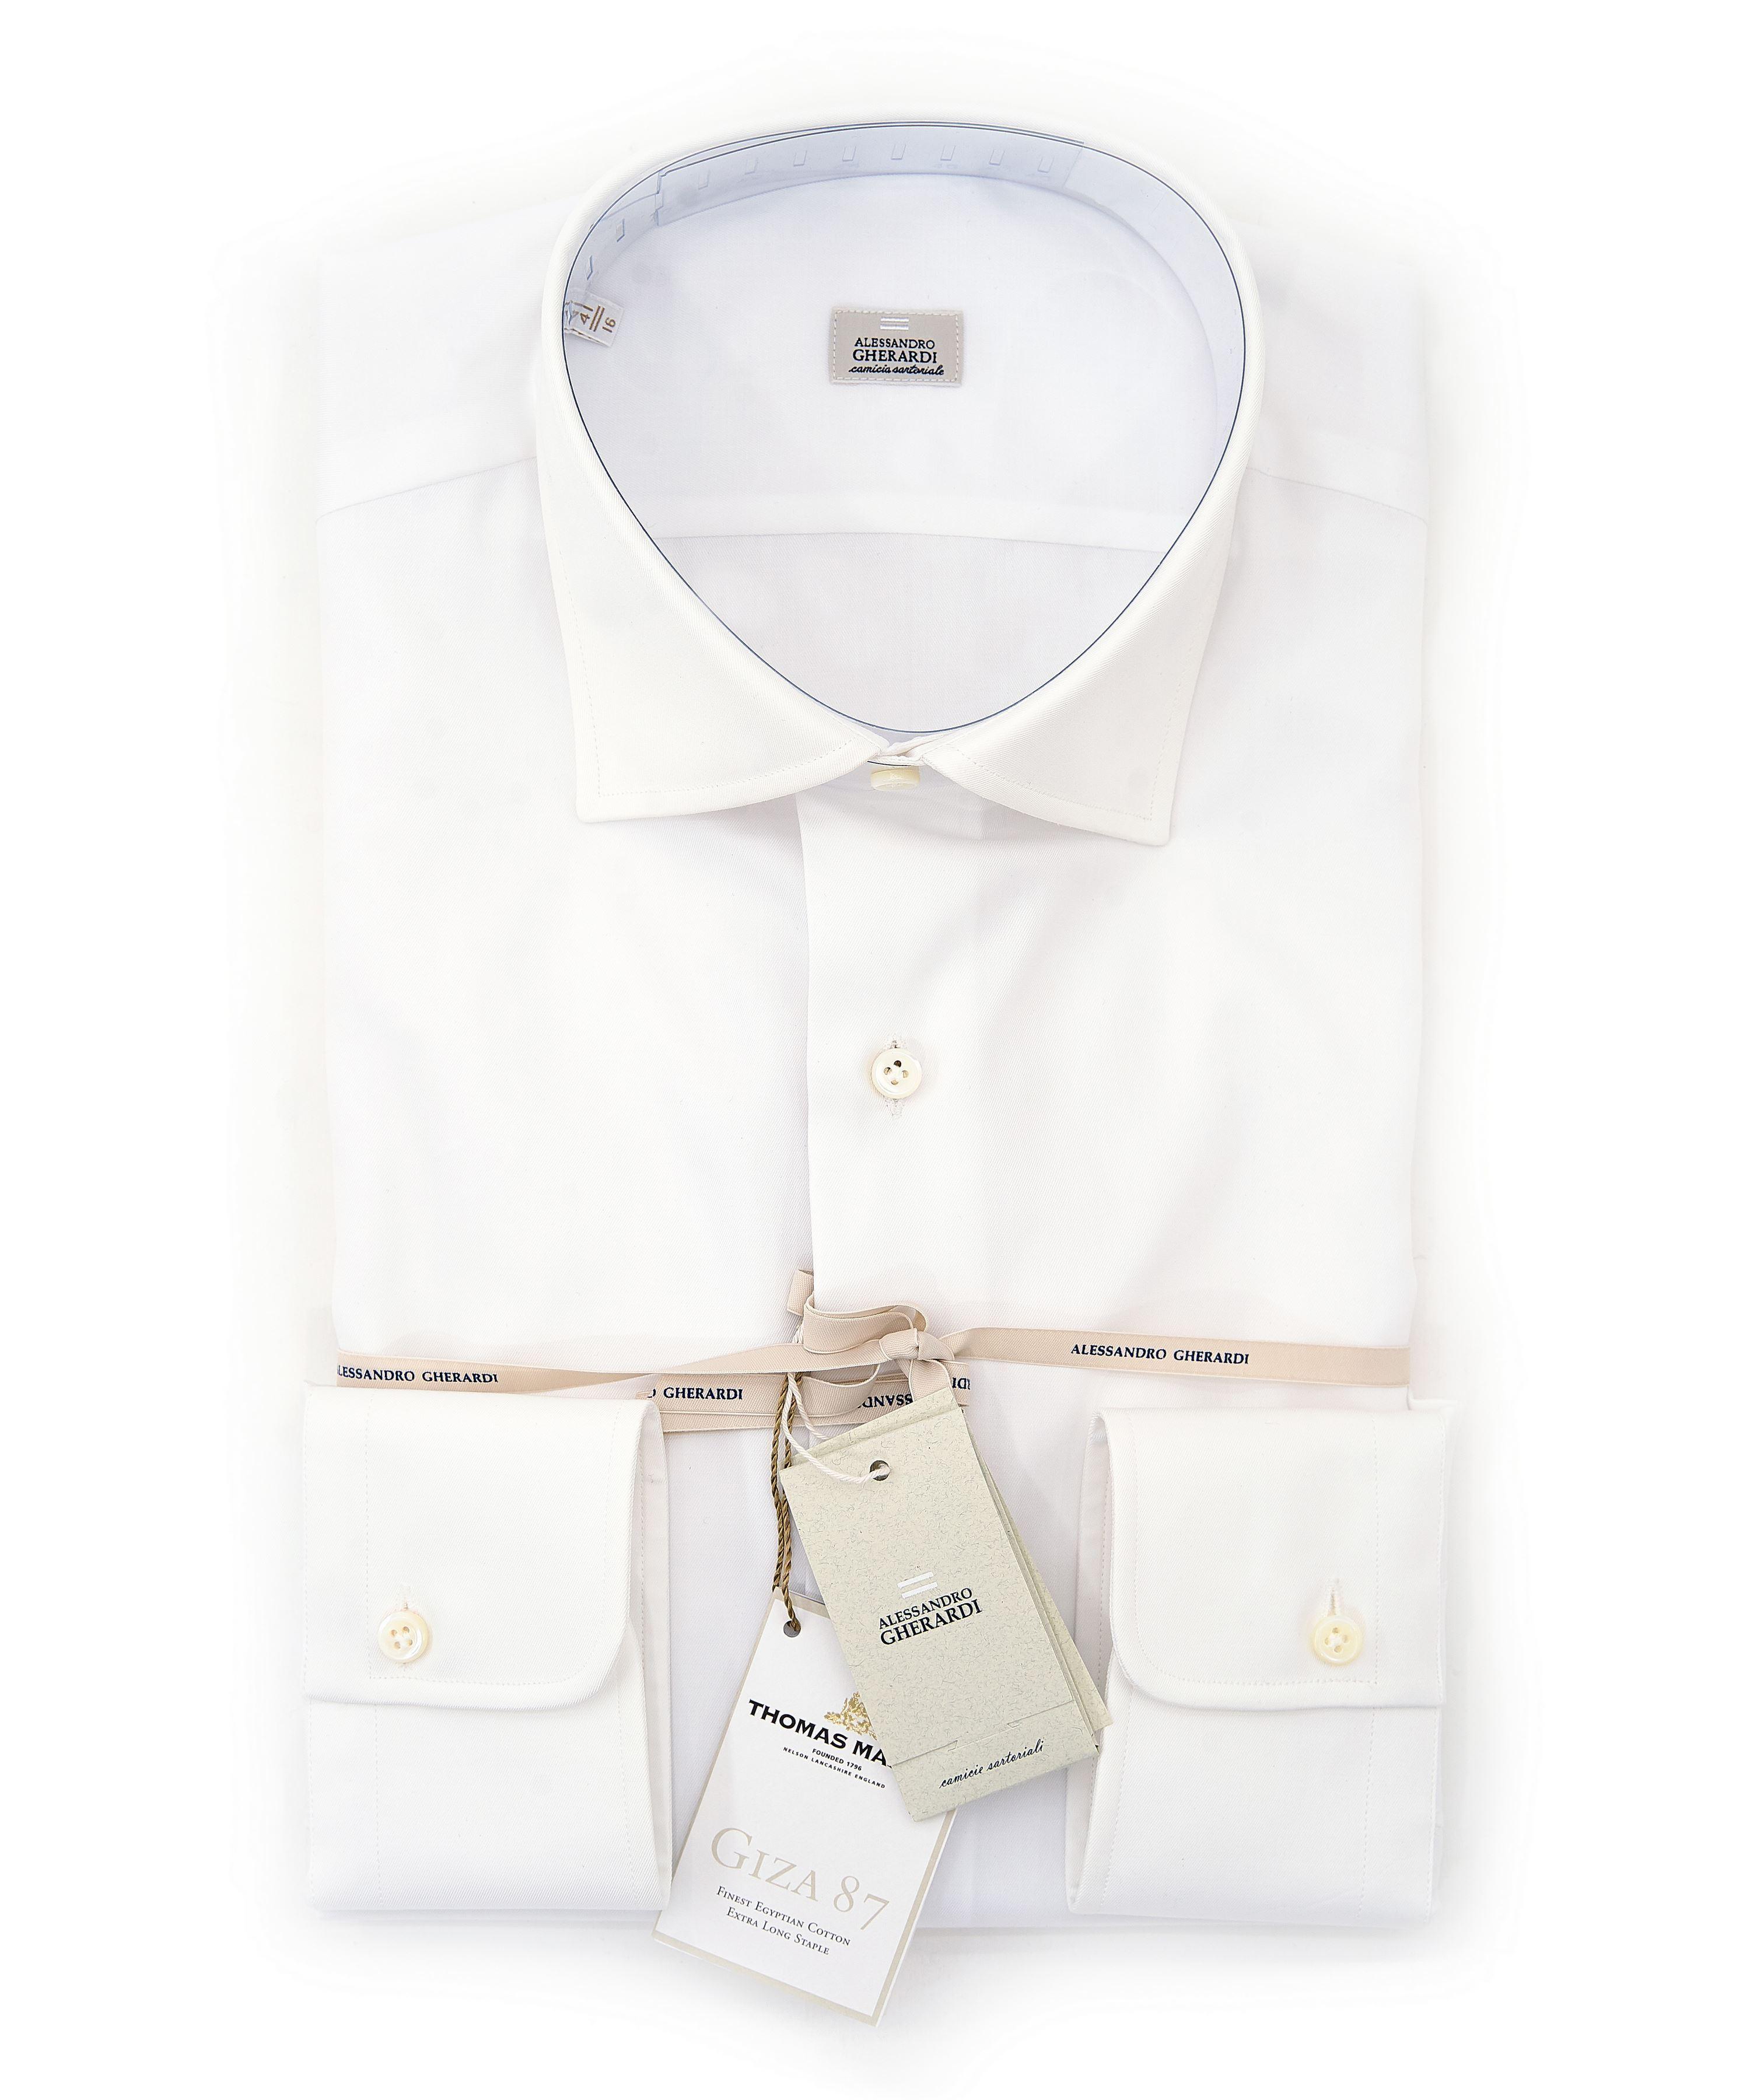 Immagine di Camicia bianca in twill di cotone